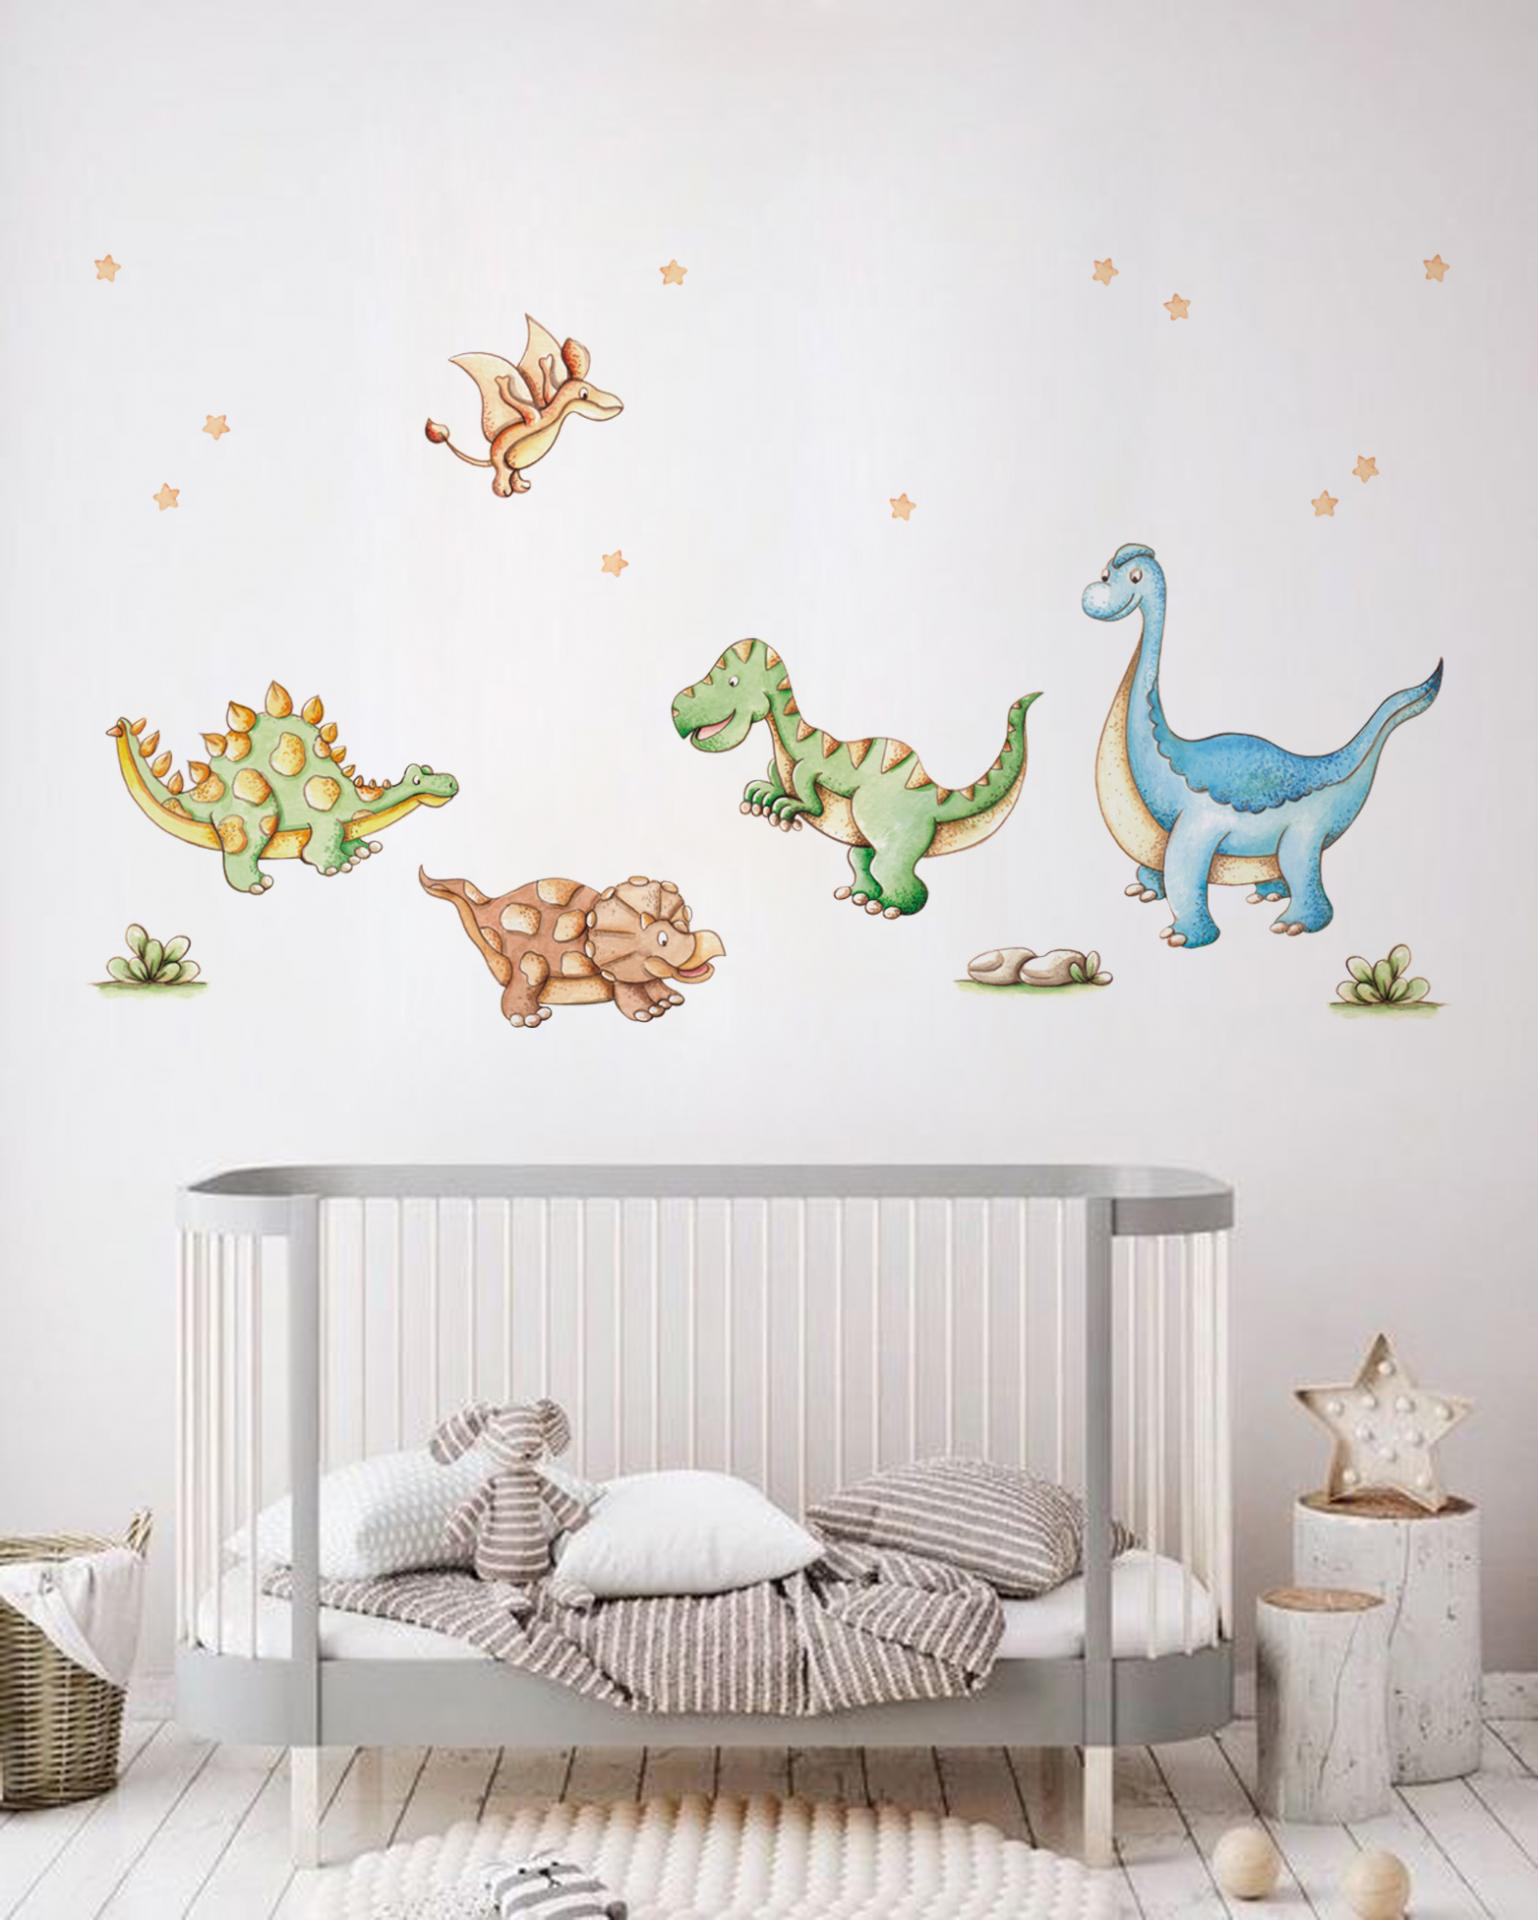 VINILO INFANTIL: Dinosaurios